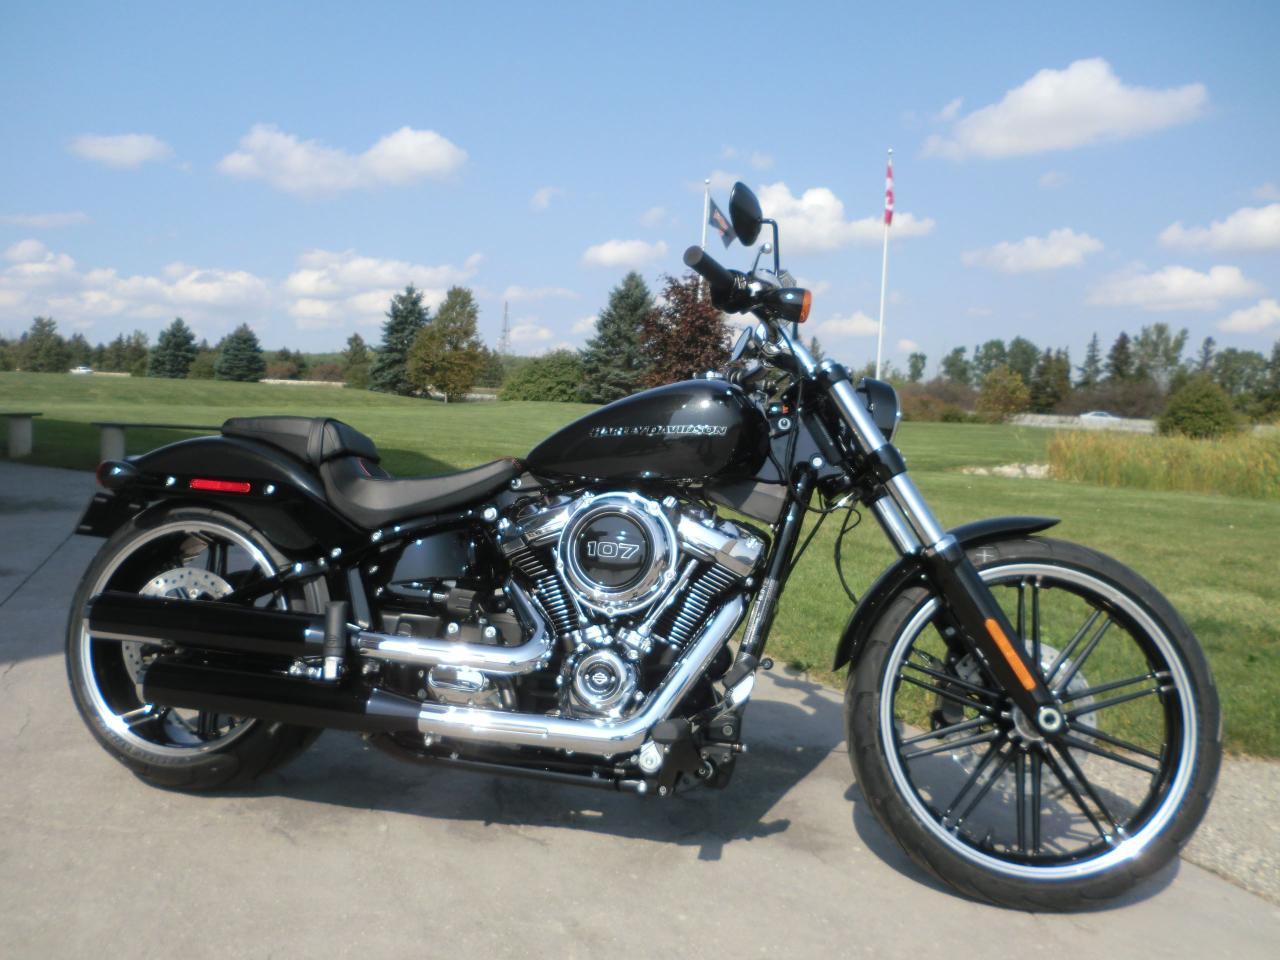 2018 Harley-Davidson Softail FXBR SOFTAIL BREAKOUT